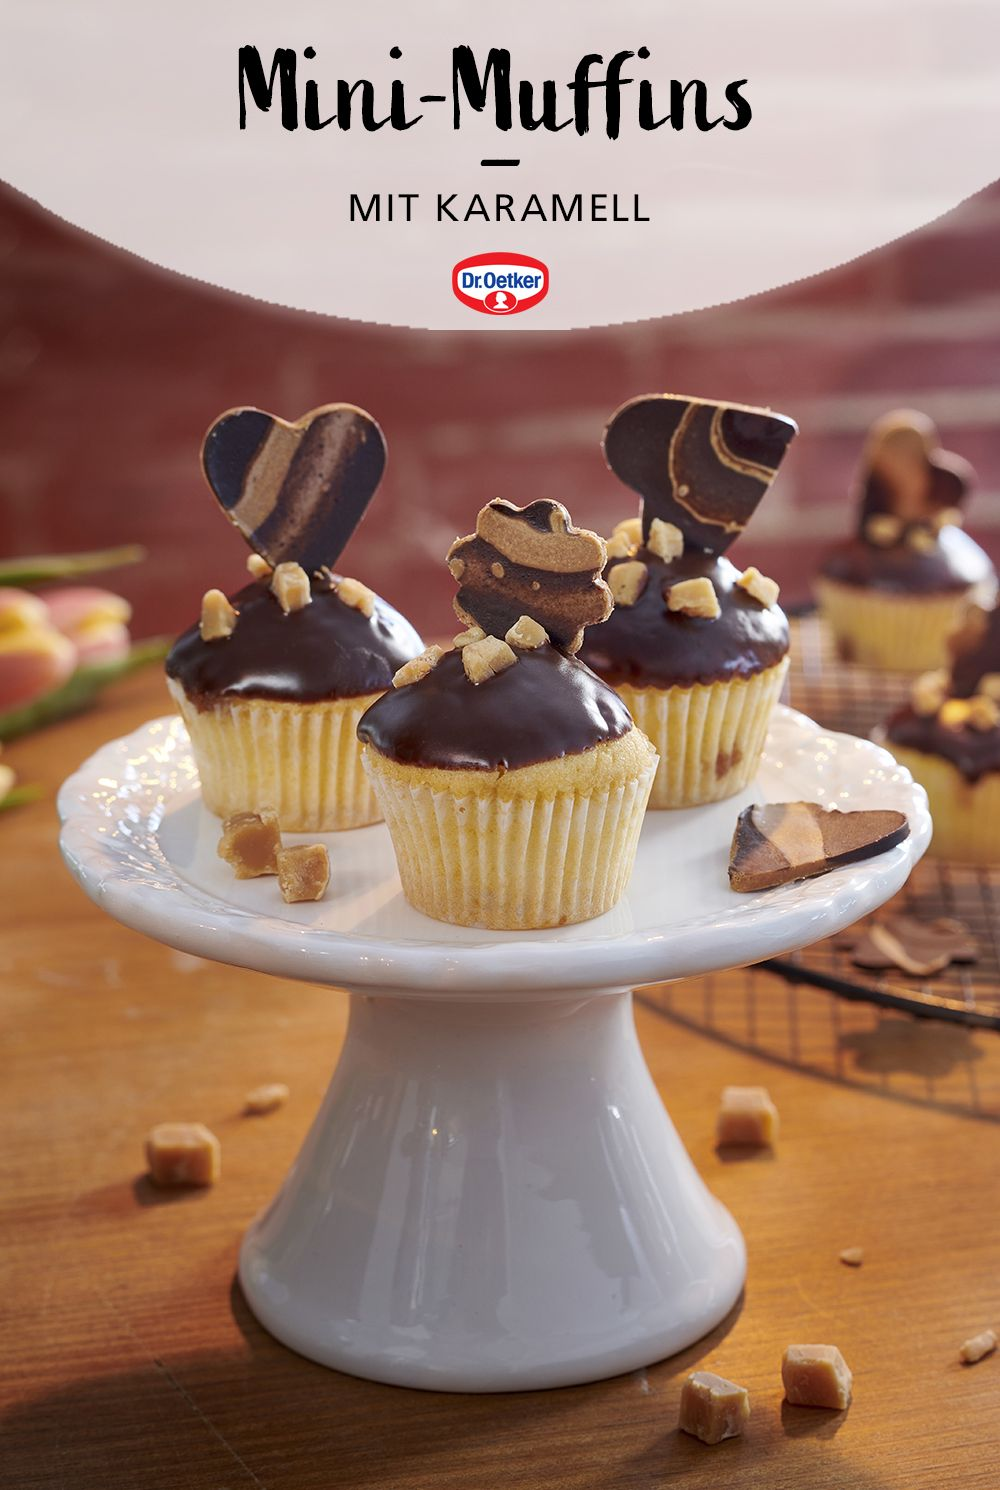 Mini Muffins Mit Karamell Rezept In 2020 Dessert Ideen Karamell Rezept Muffins